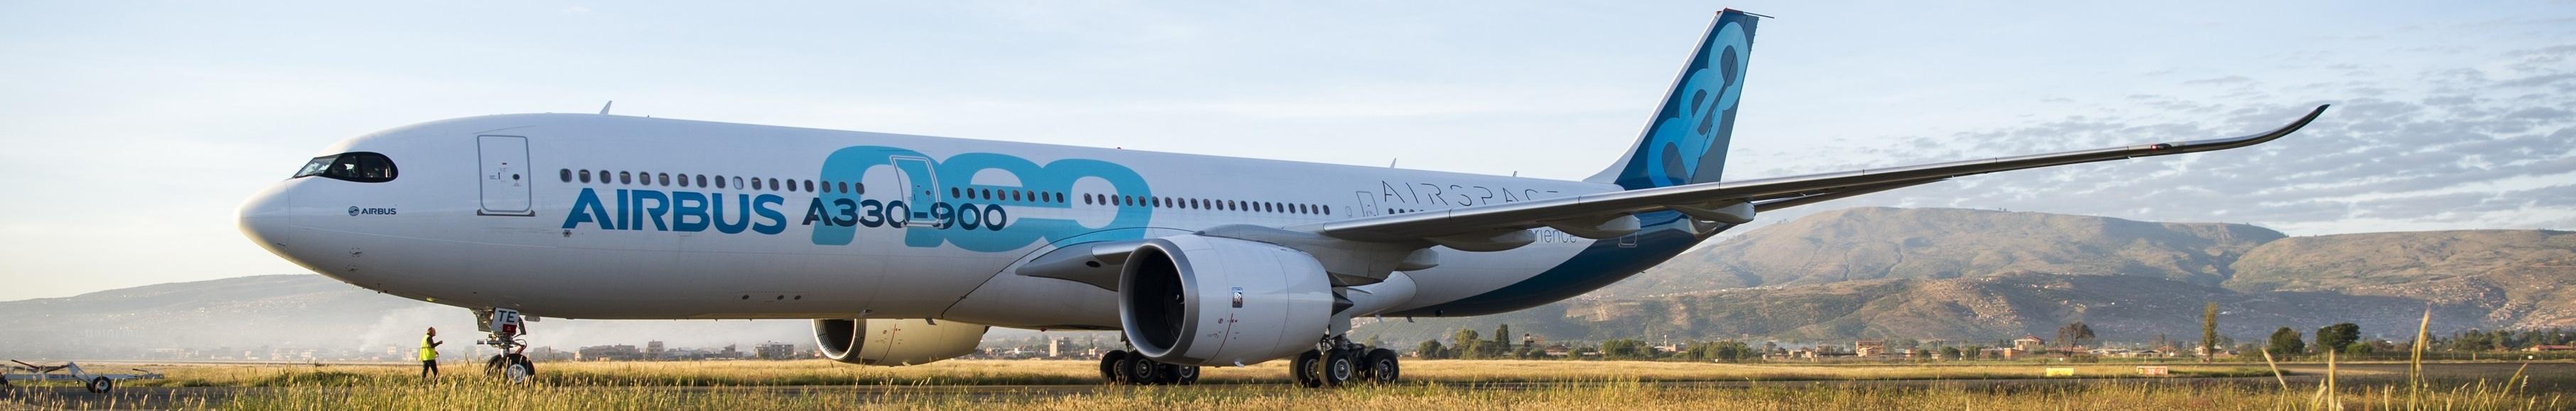 空中客车Airbus banner